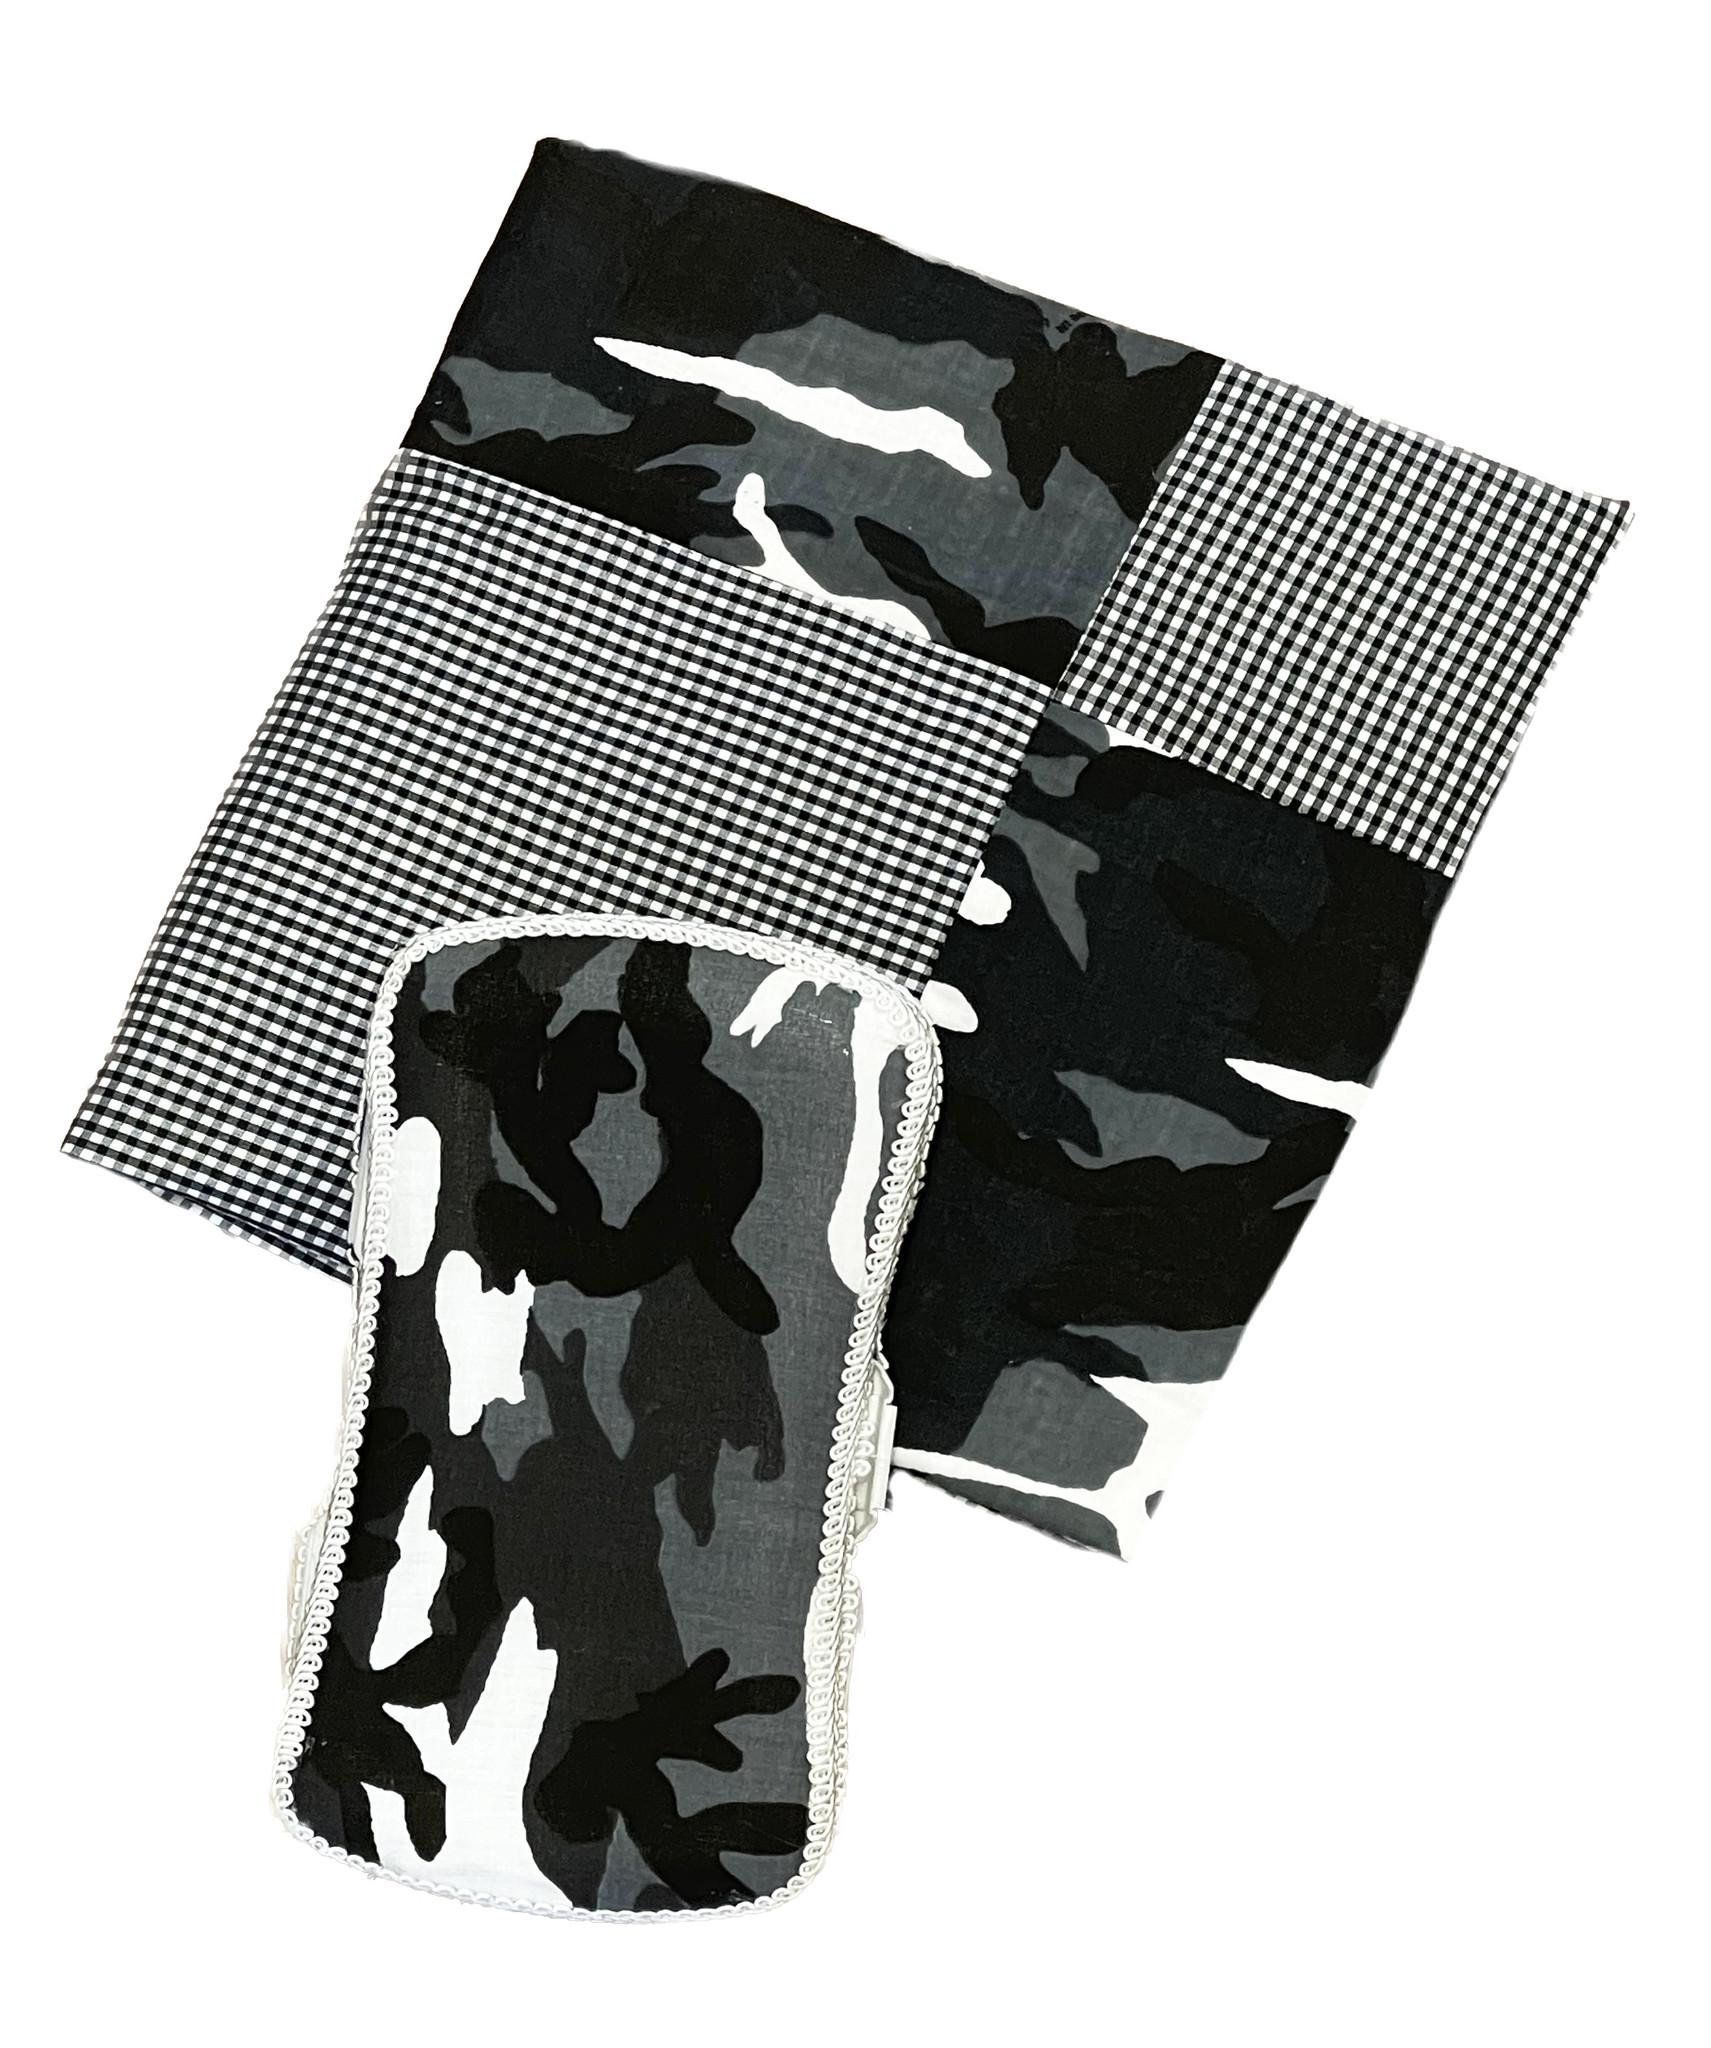 Amy's Black/Grey Camo Blanket